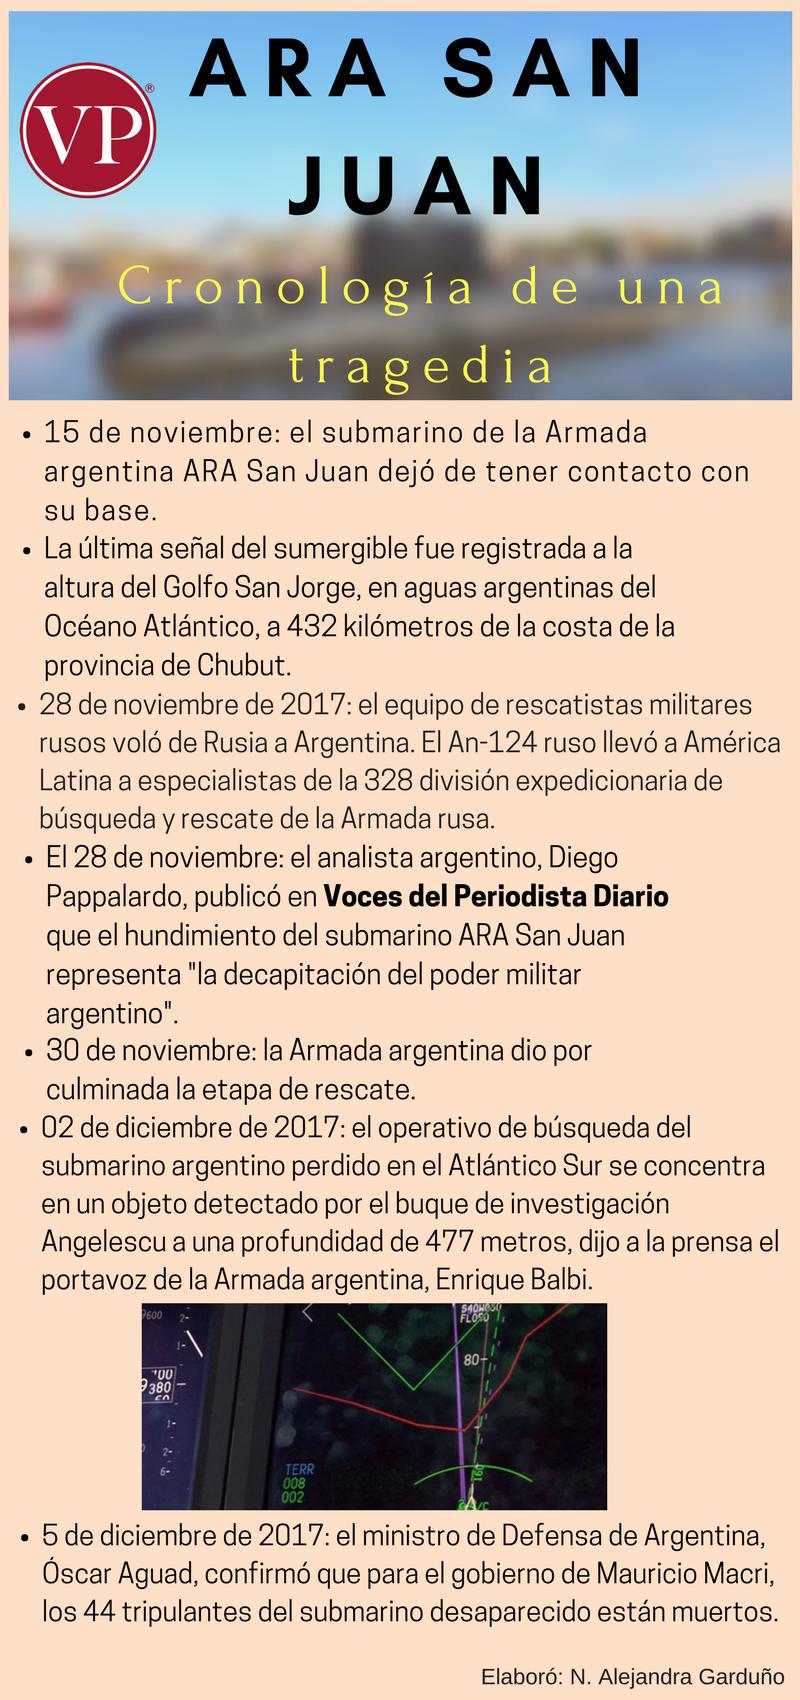 ARA San Juan (2)